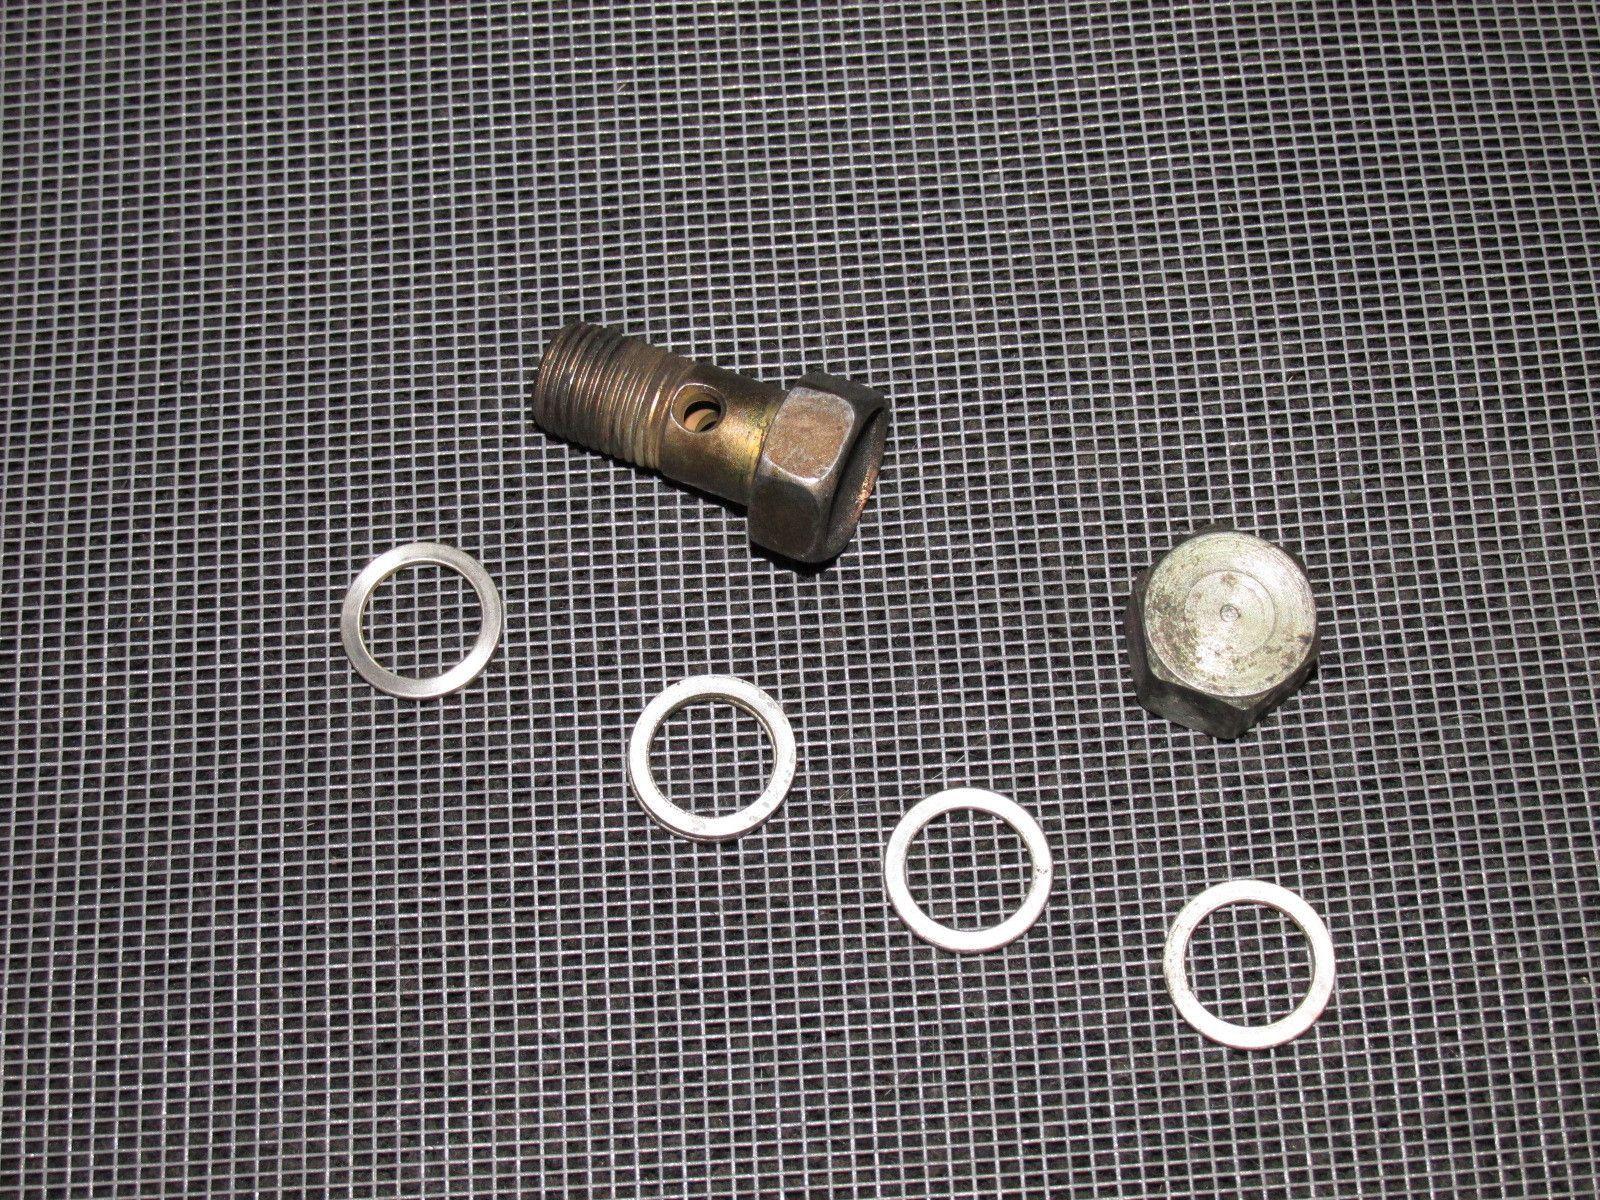 96 97 98 99 00 honda civic oem fuel filter line banjo bolt [ 1600 x 1200 Pixel ]